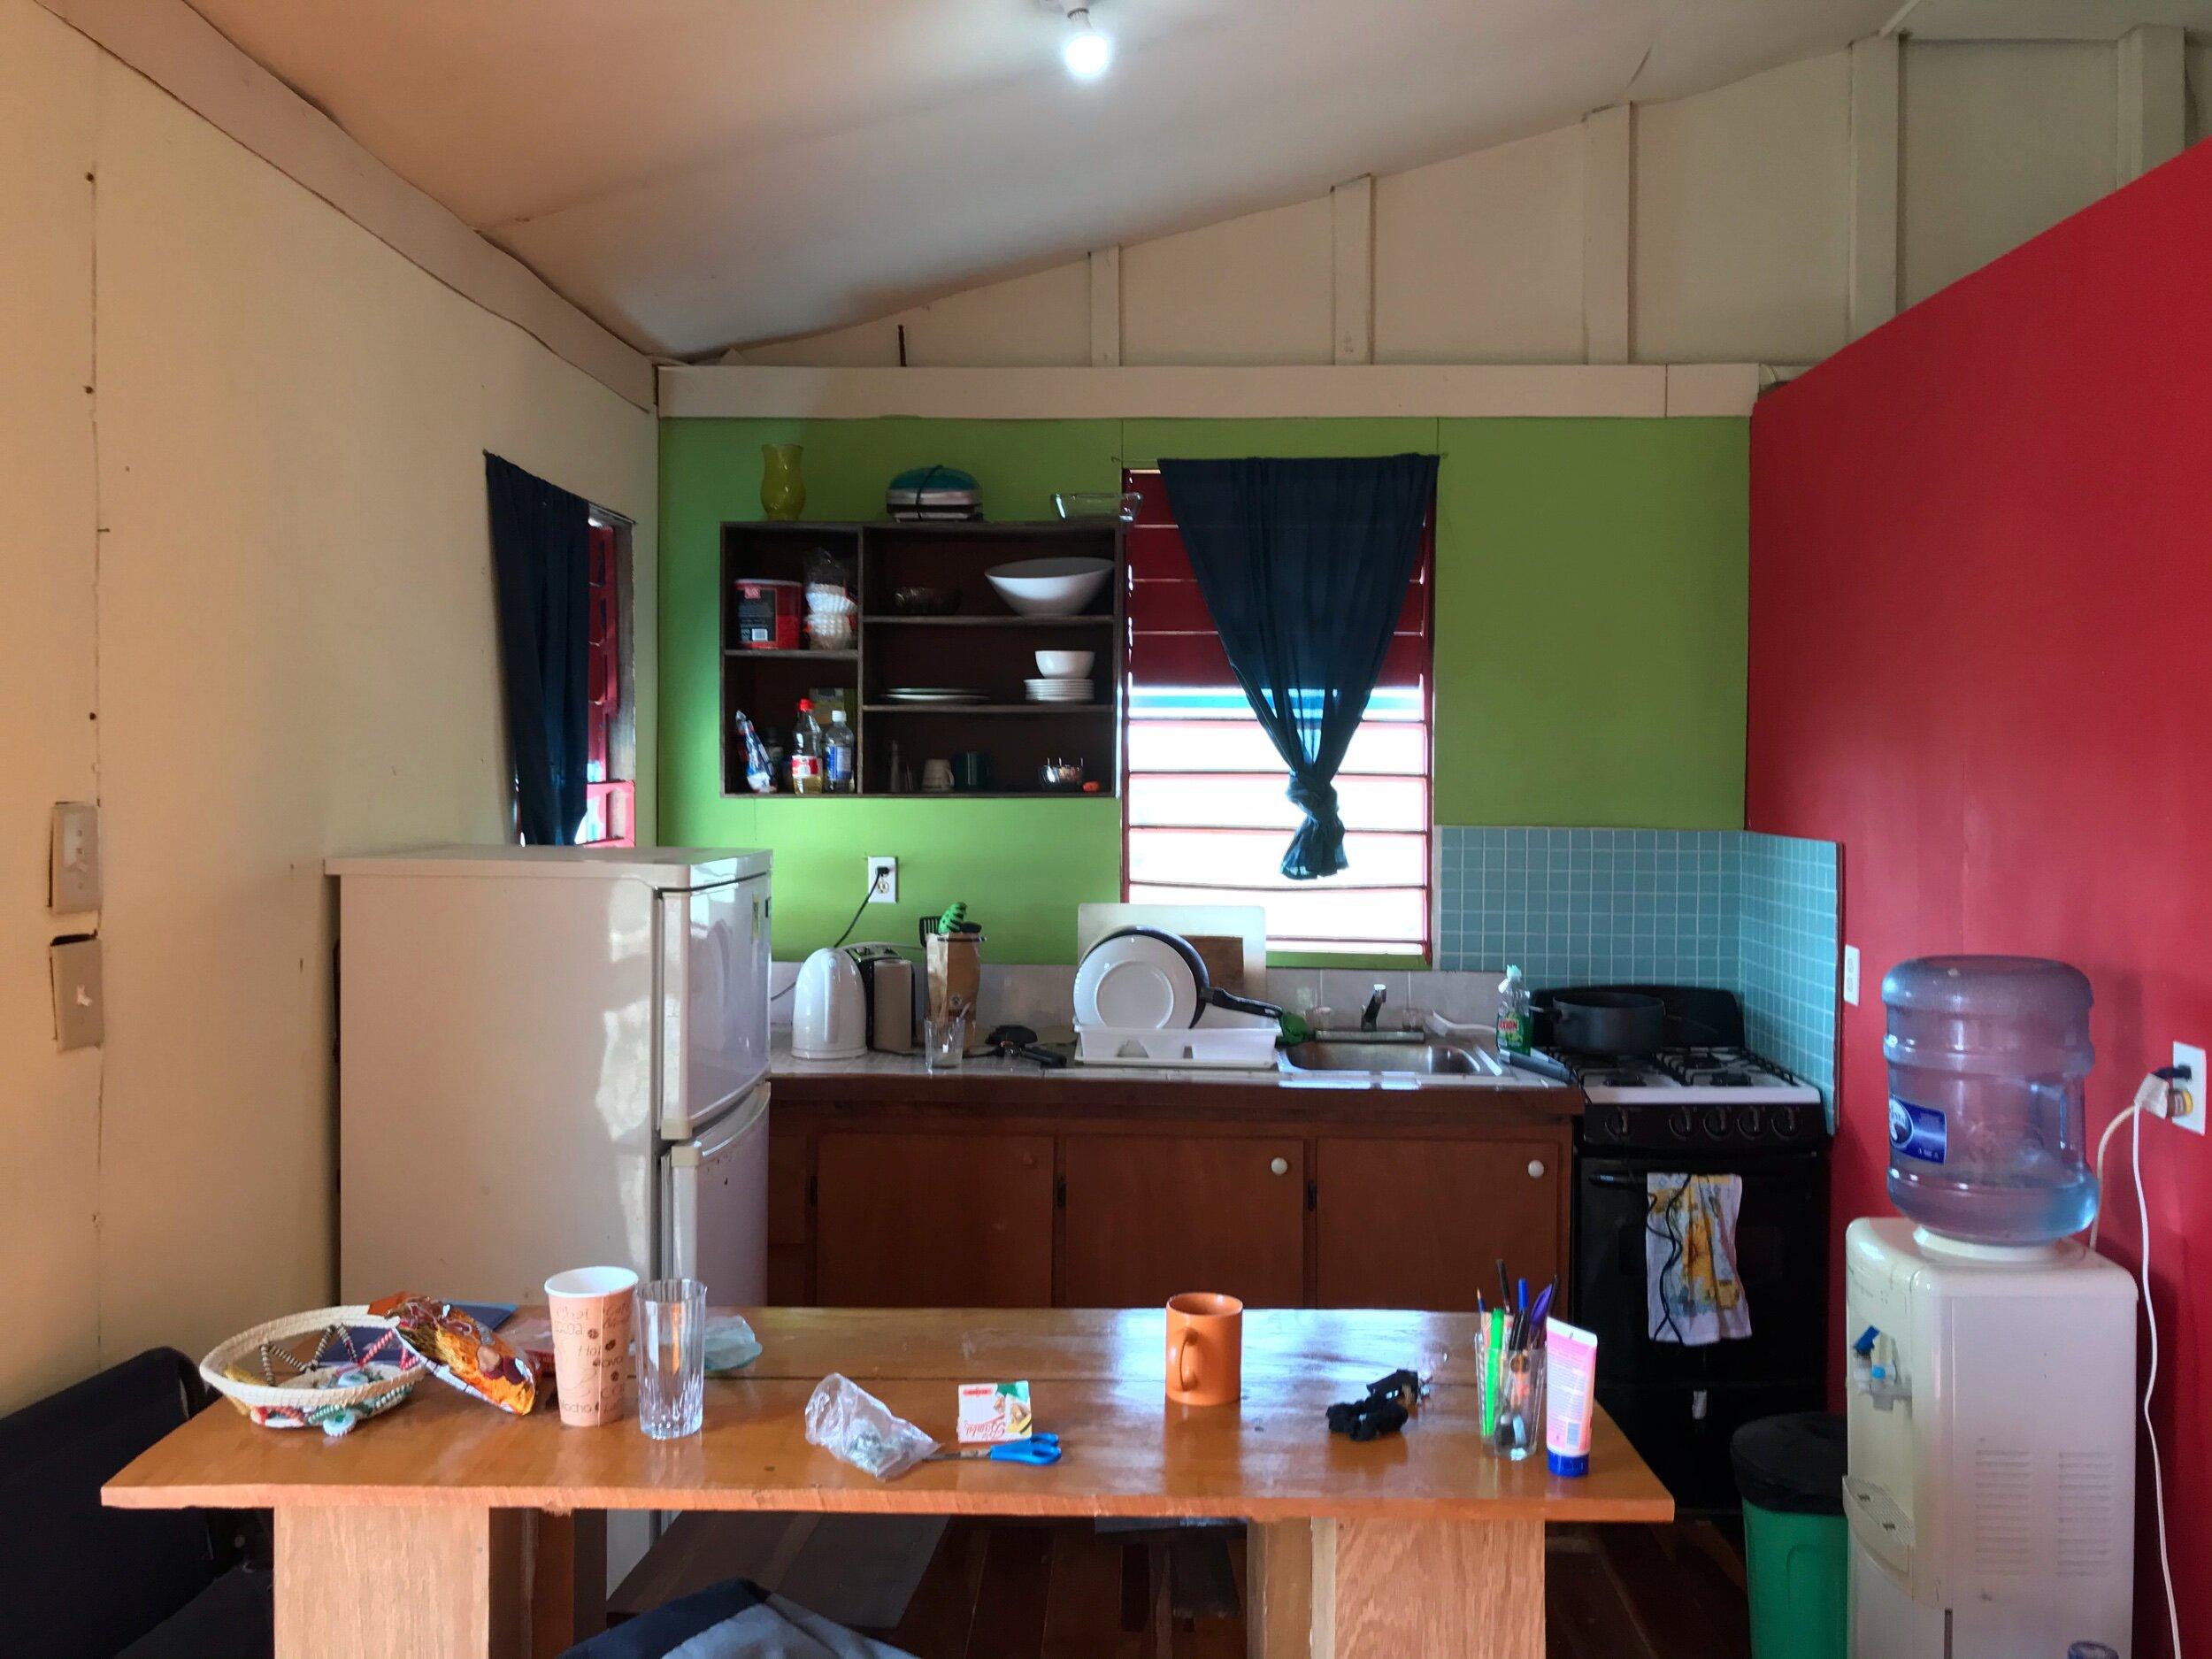 Spoonbill House Airbnb Caye Caulker Belize Exploratory Glory Travel Blog Tinyhouse Living Travel Deals